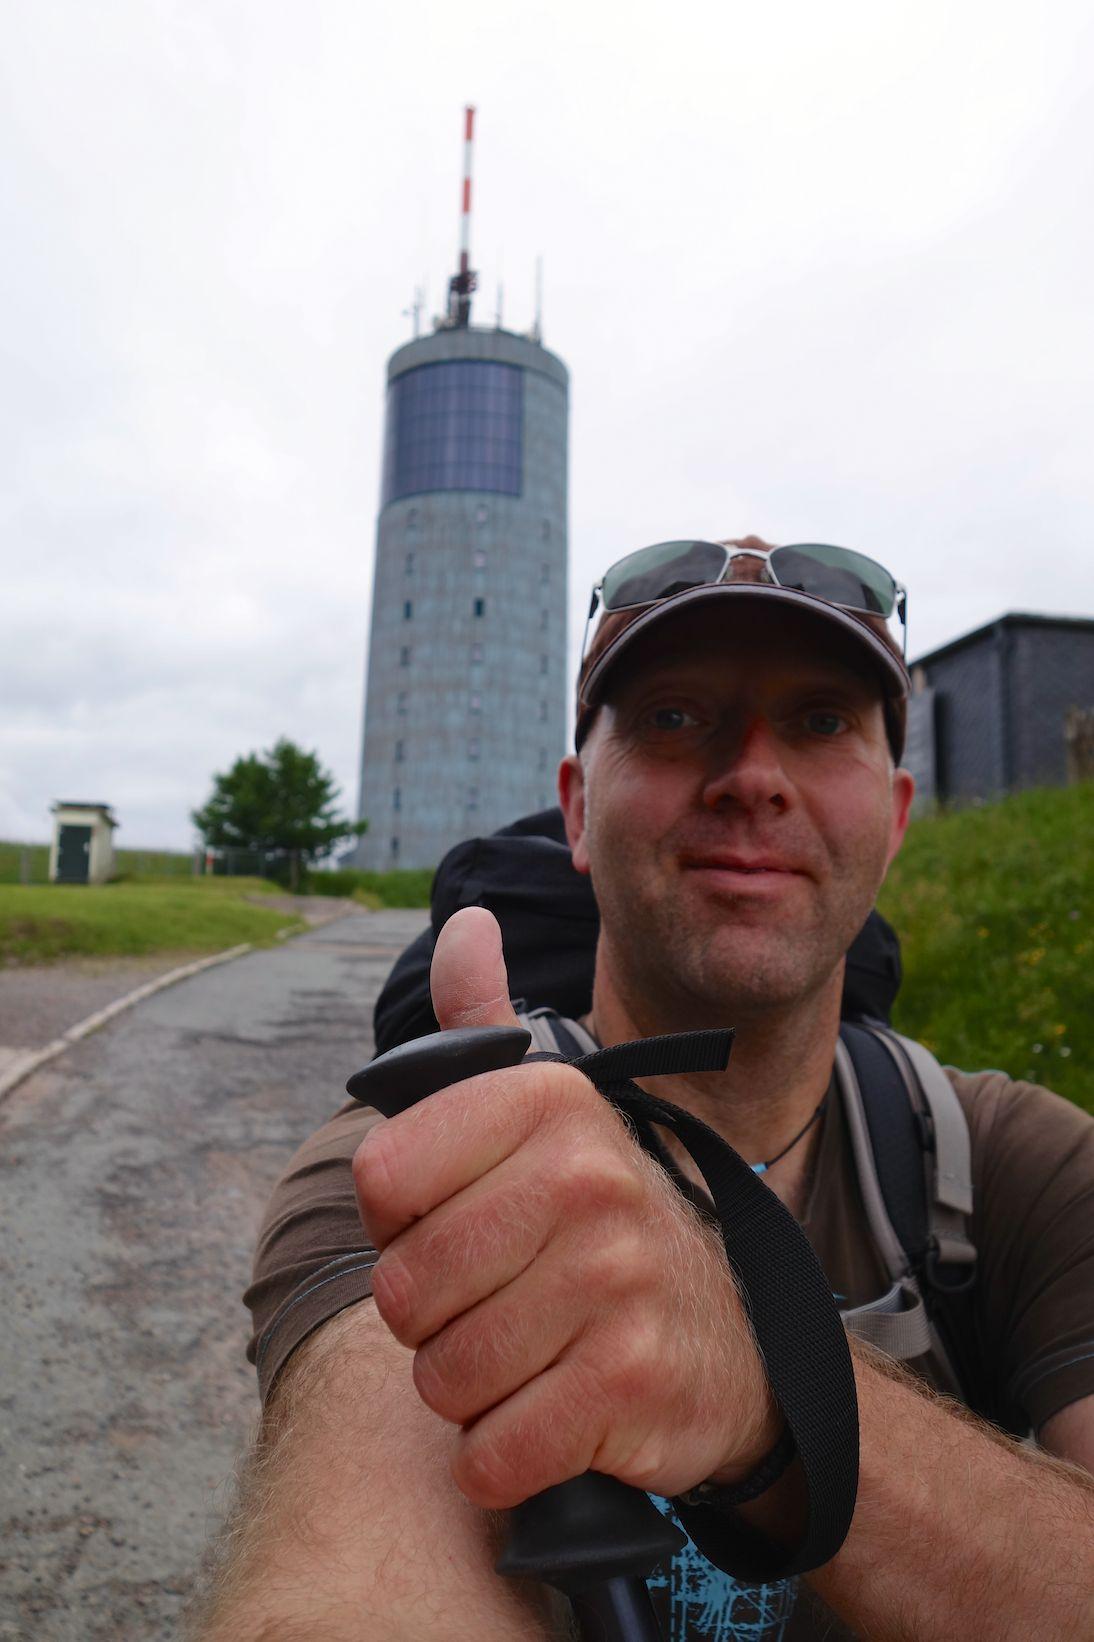 Den Inselsberg bewältigt - I did it